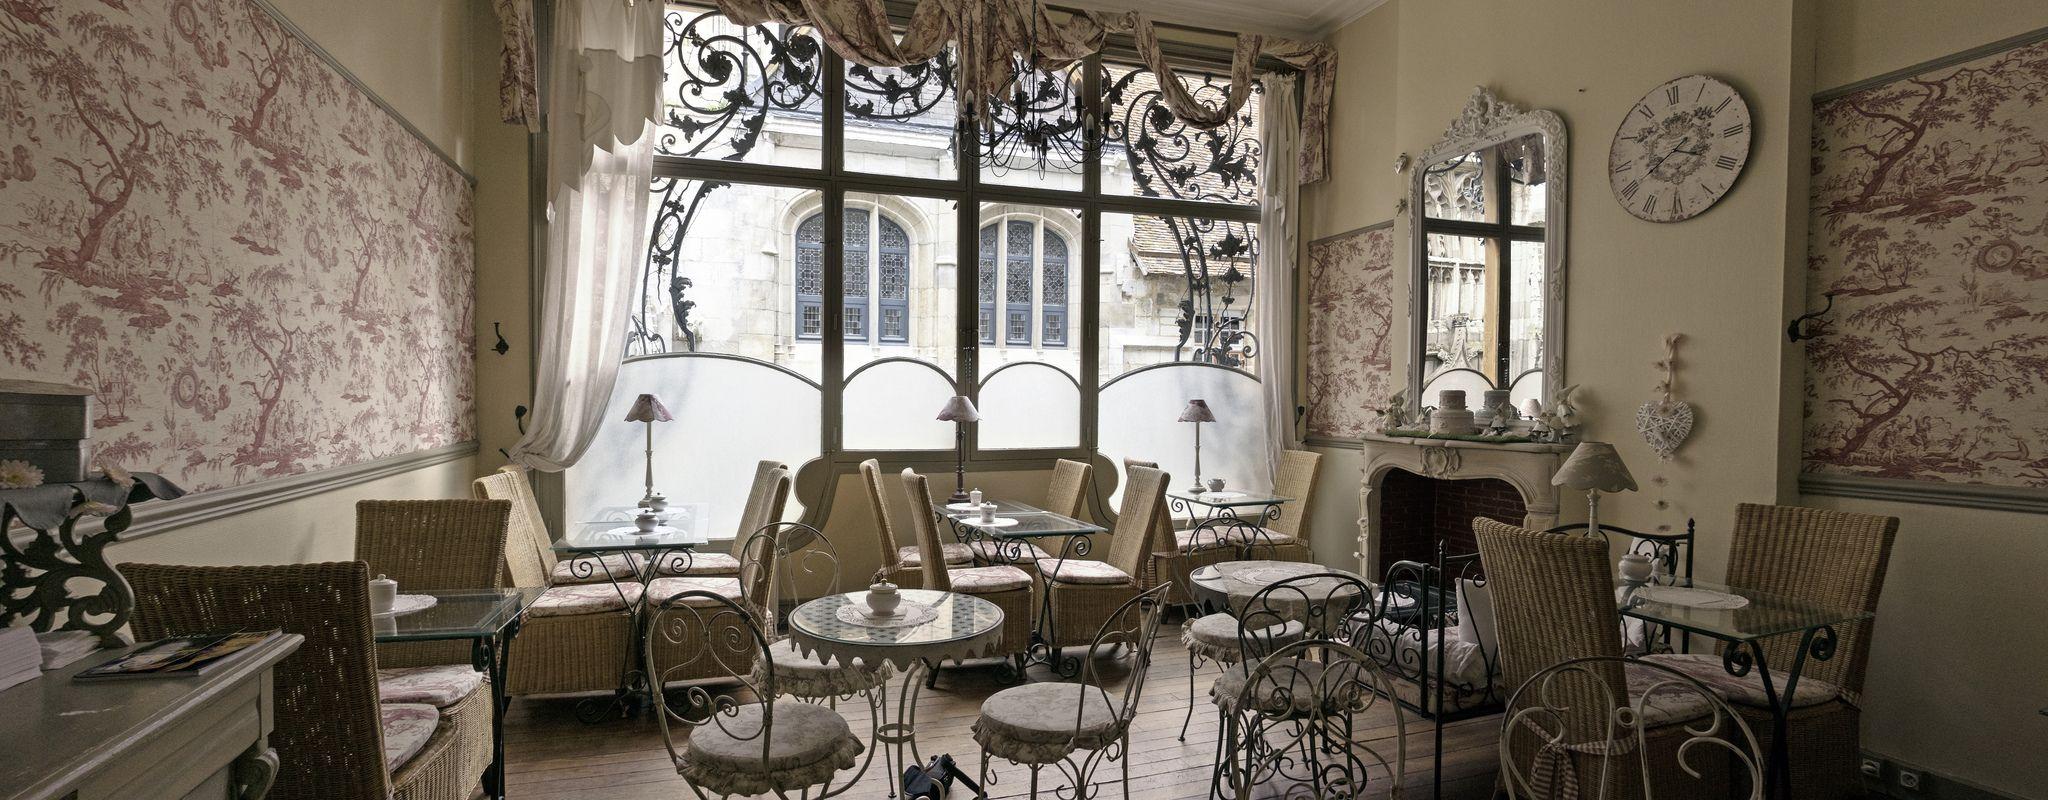 P1030053 - Salon de thé - (tearoom) \